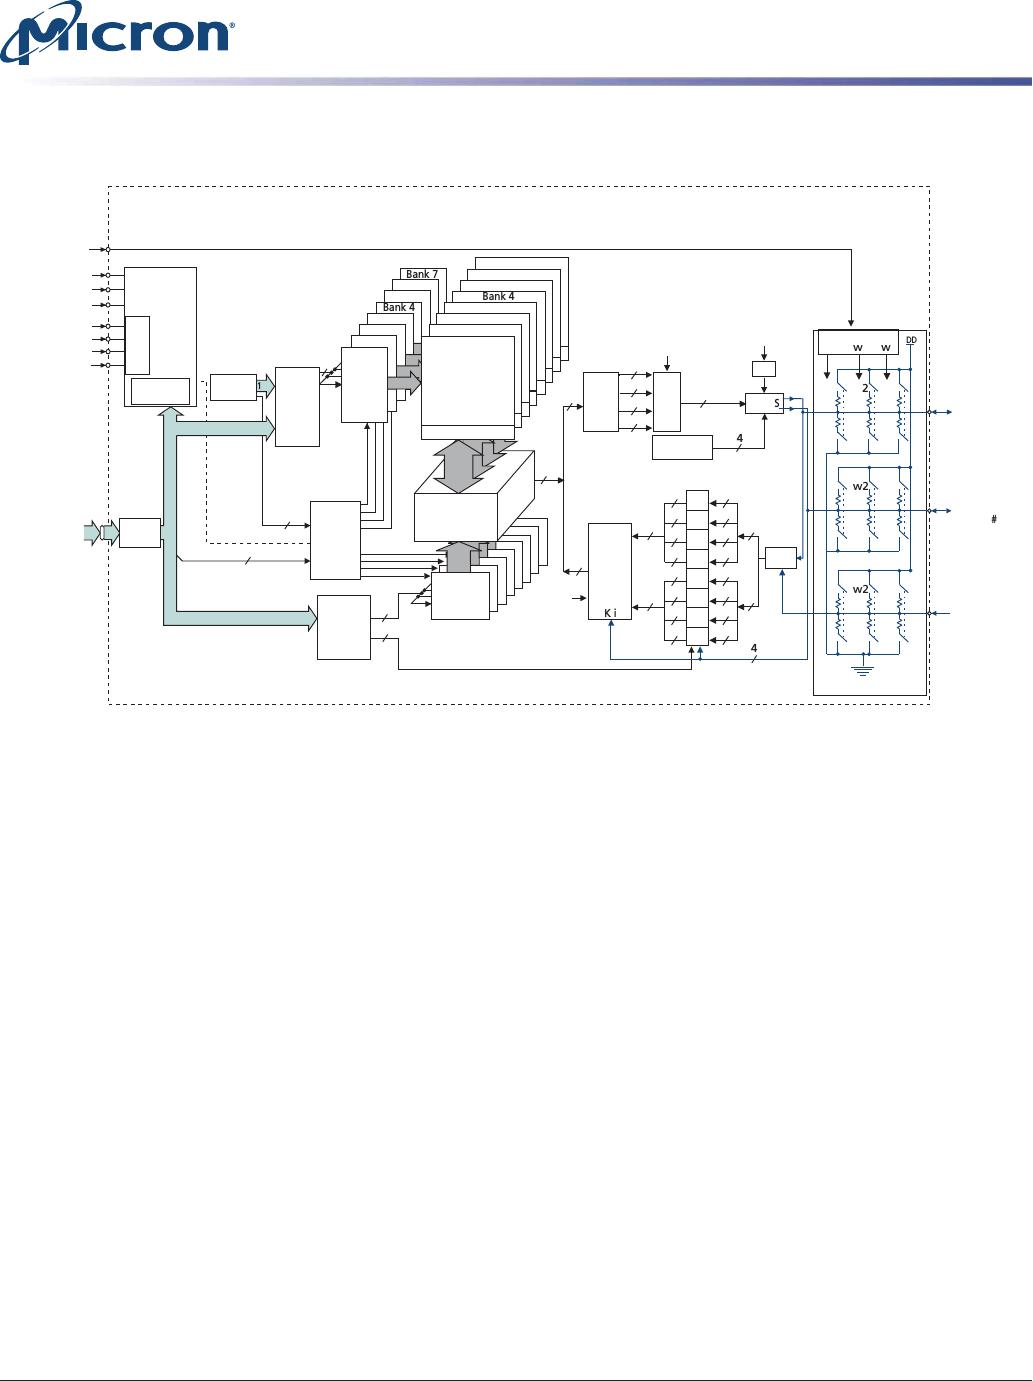 Mt47h256m8 128m16 512m4 Datasheet